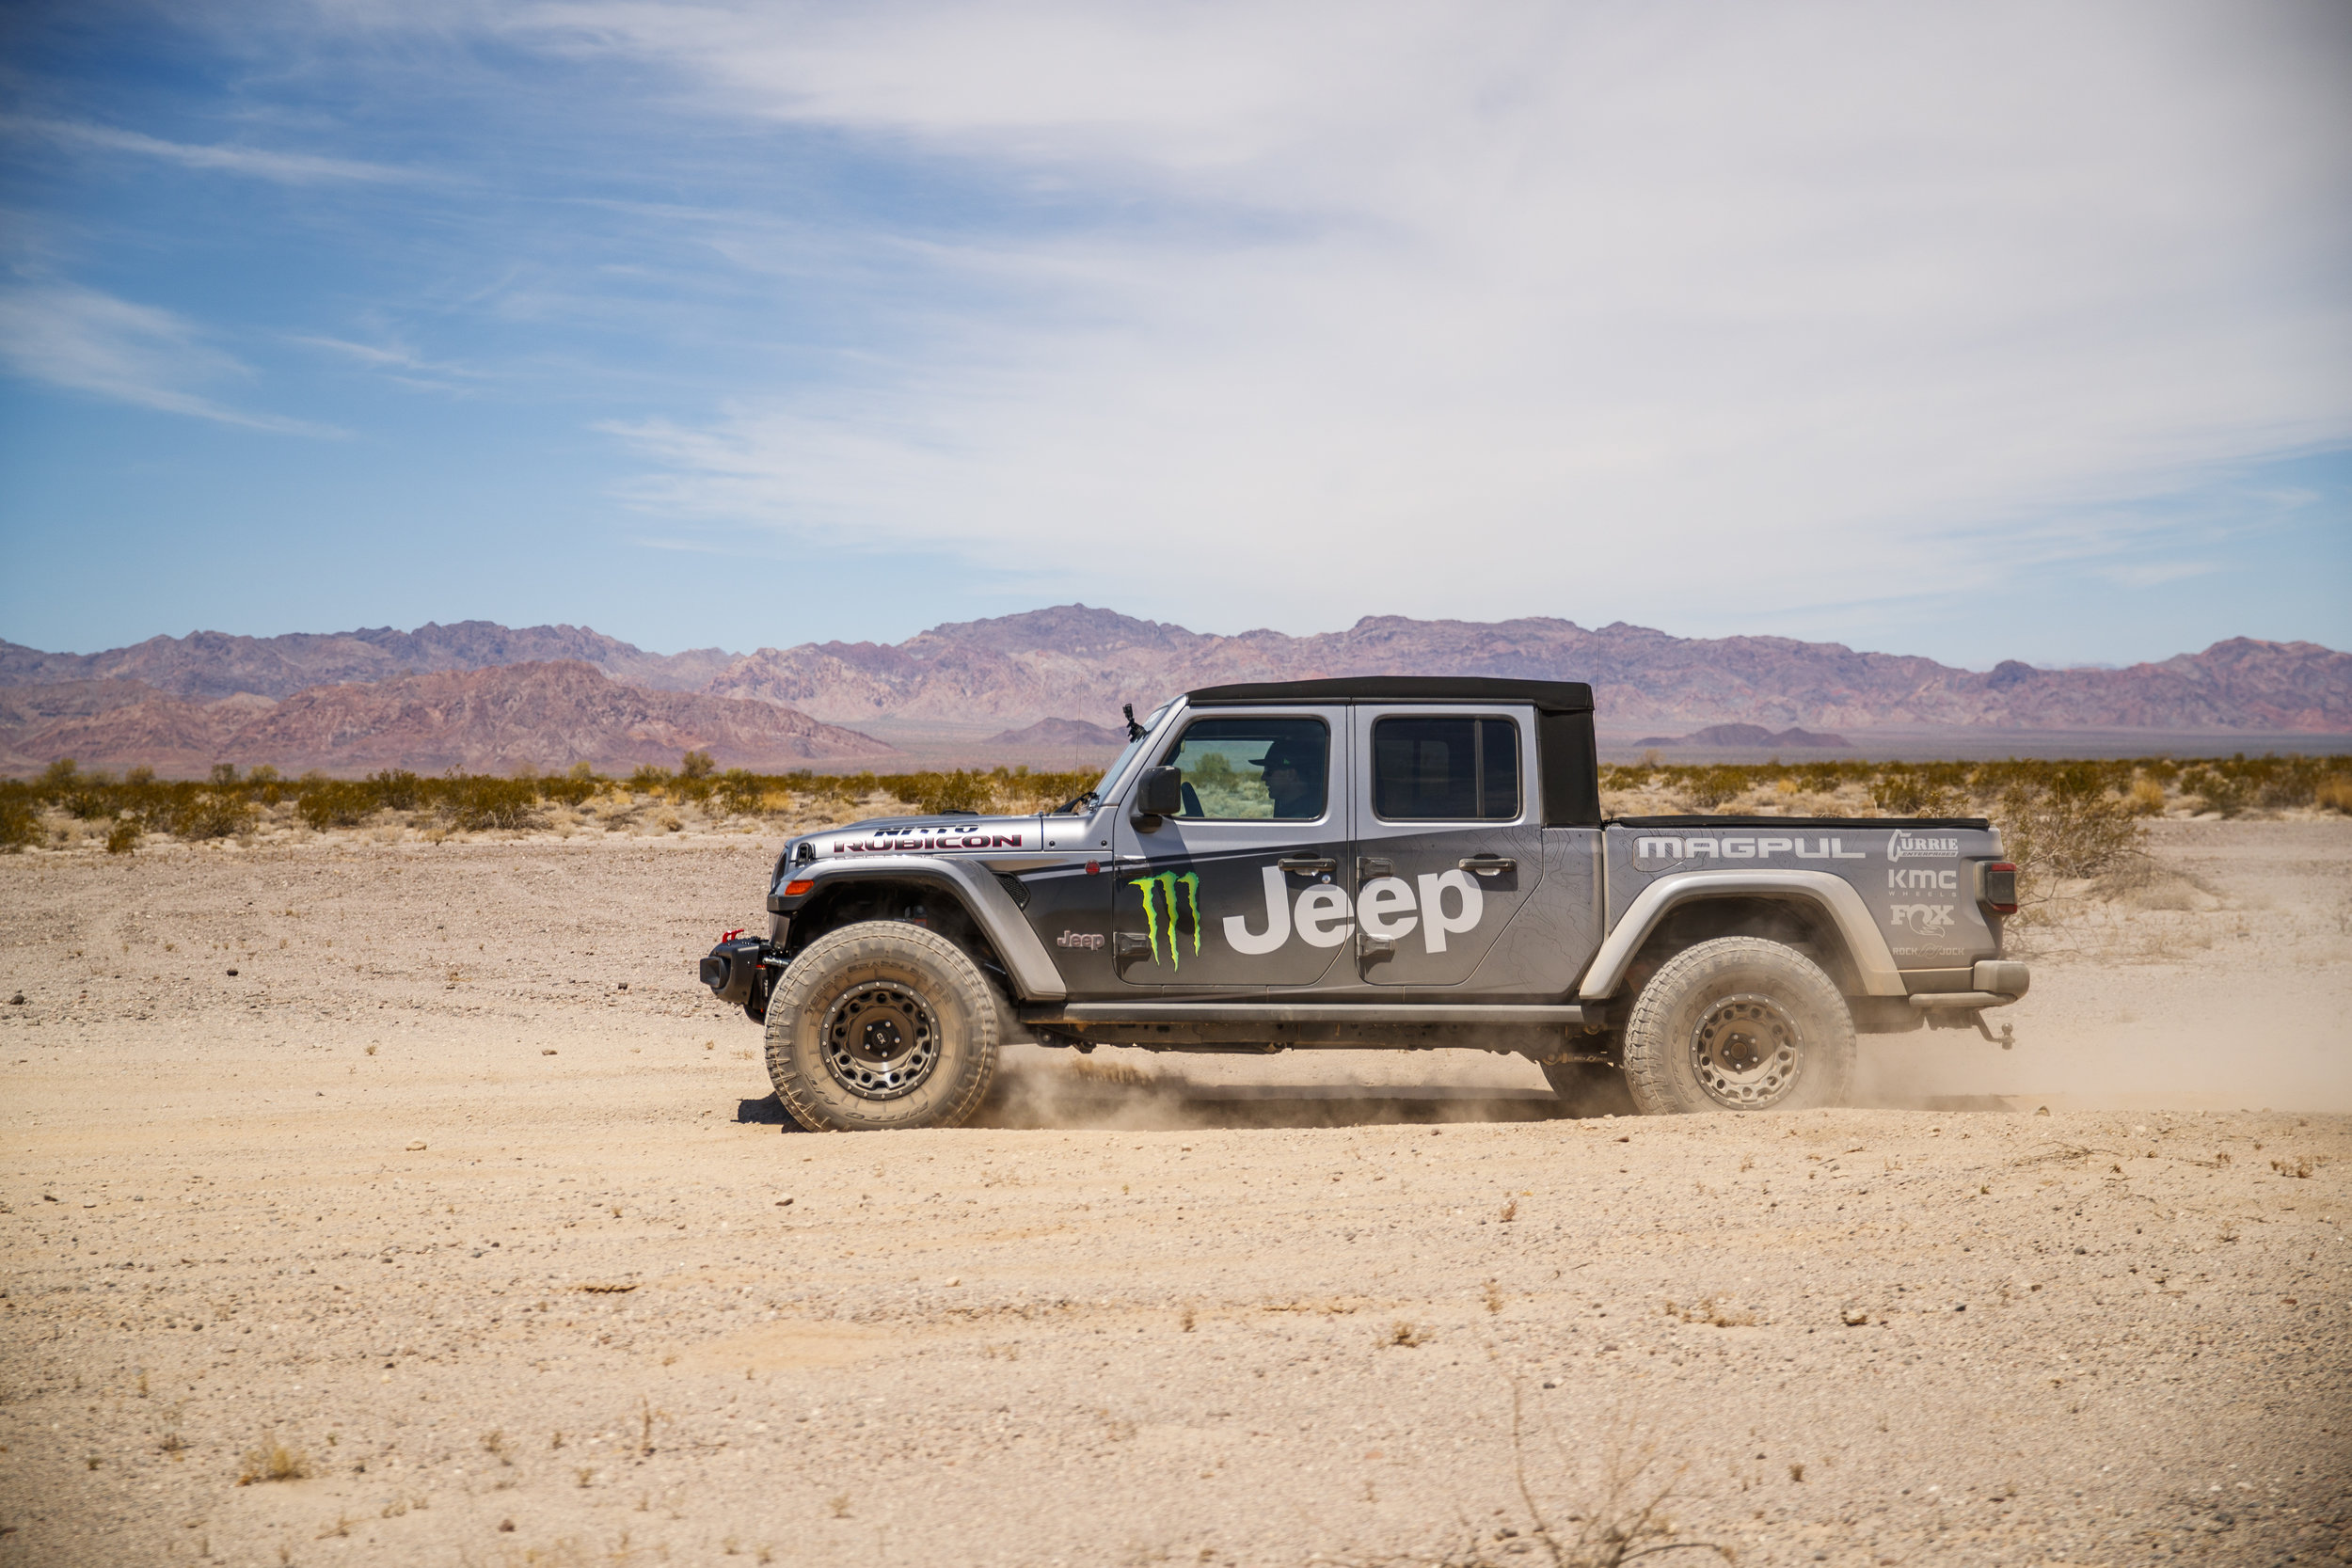 6_24_CaseyCurrie_Baja500PreRunning_BajaMexico_Jeep_003.jpg